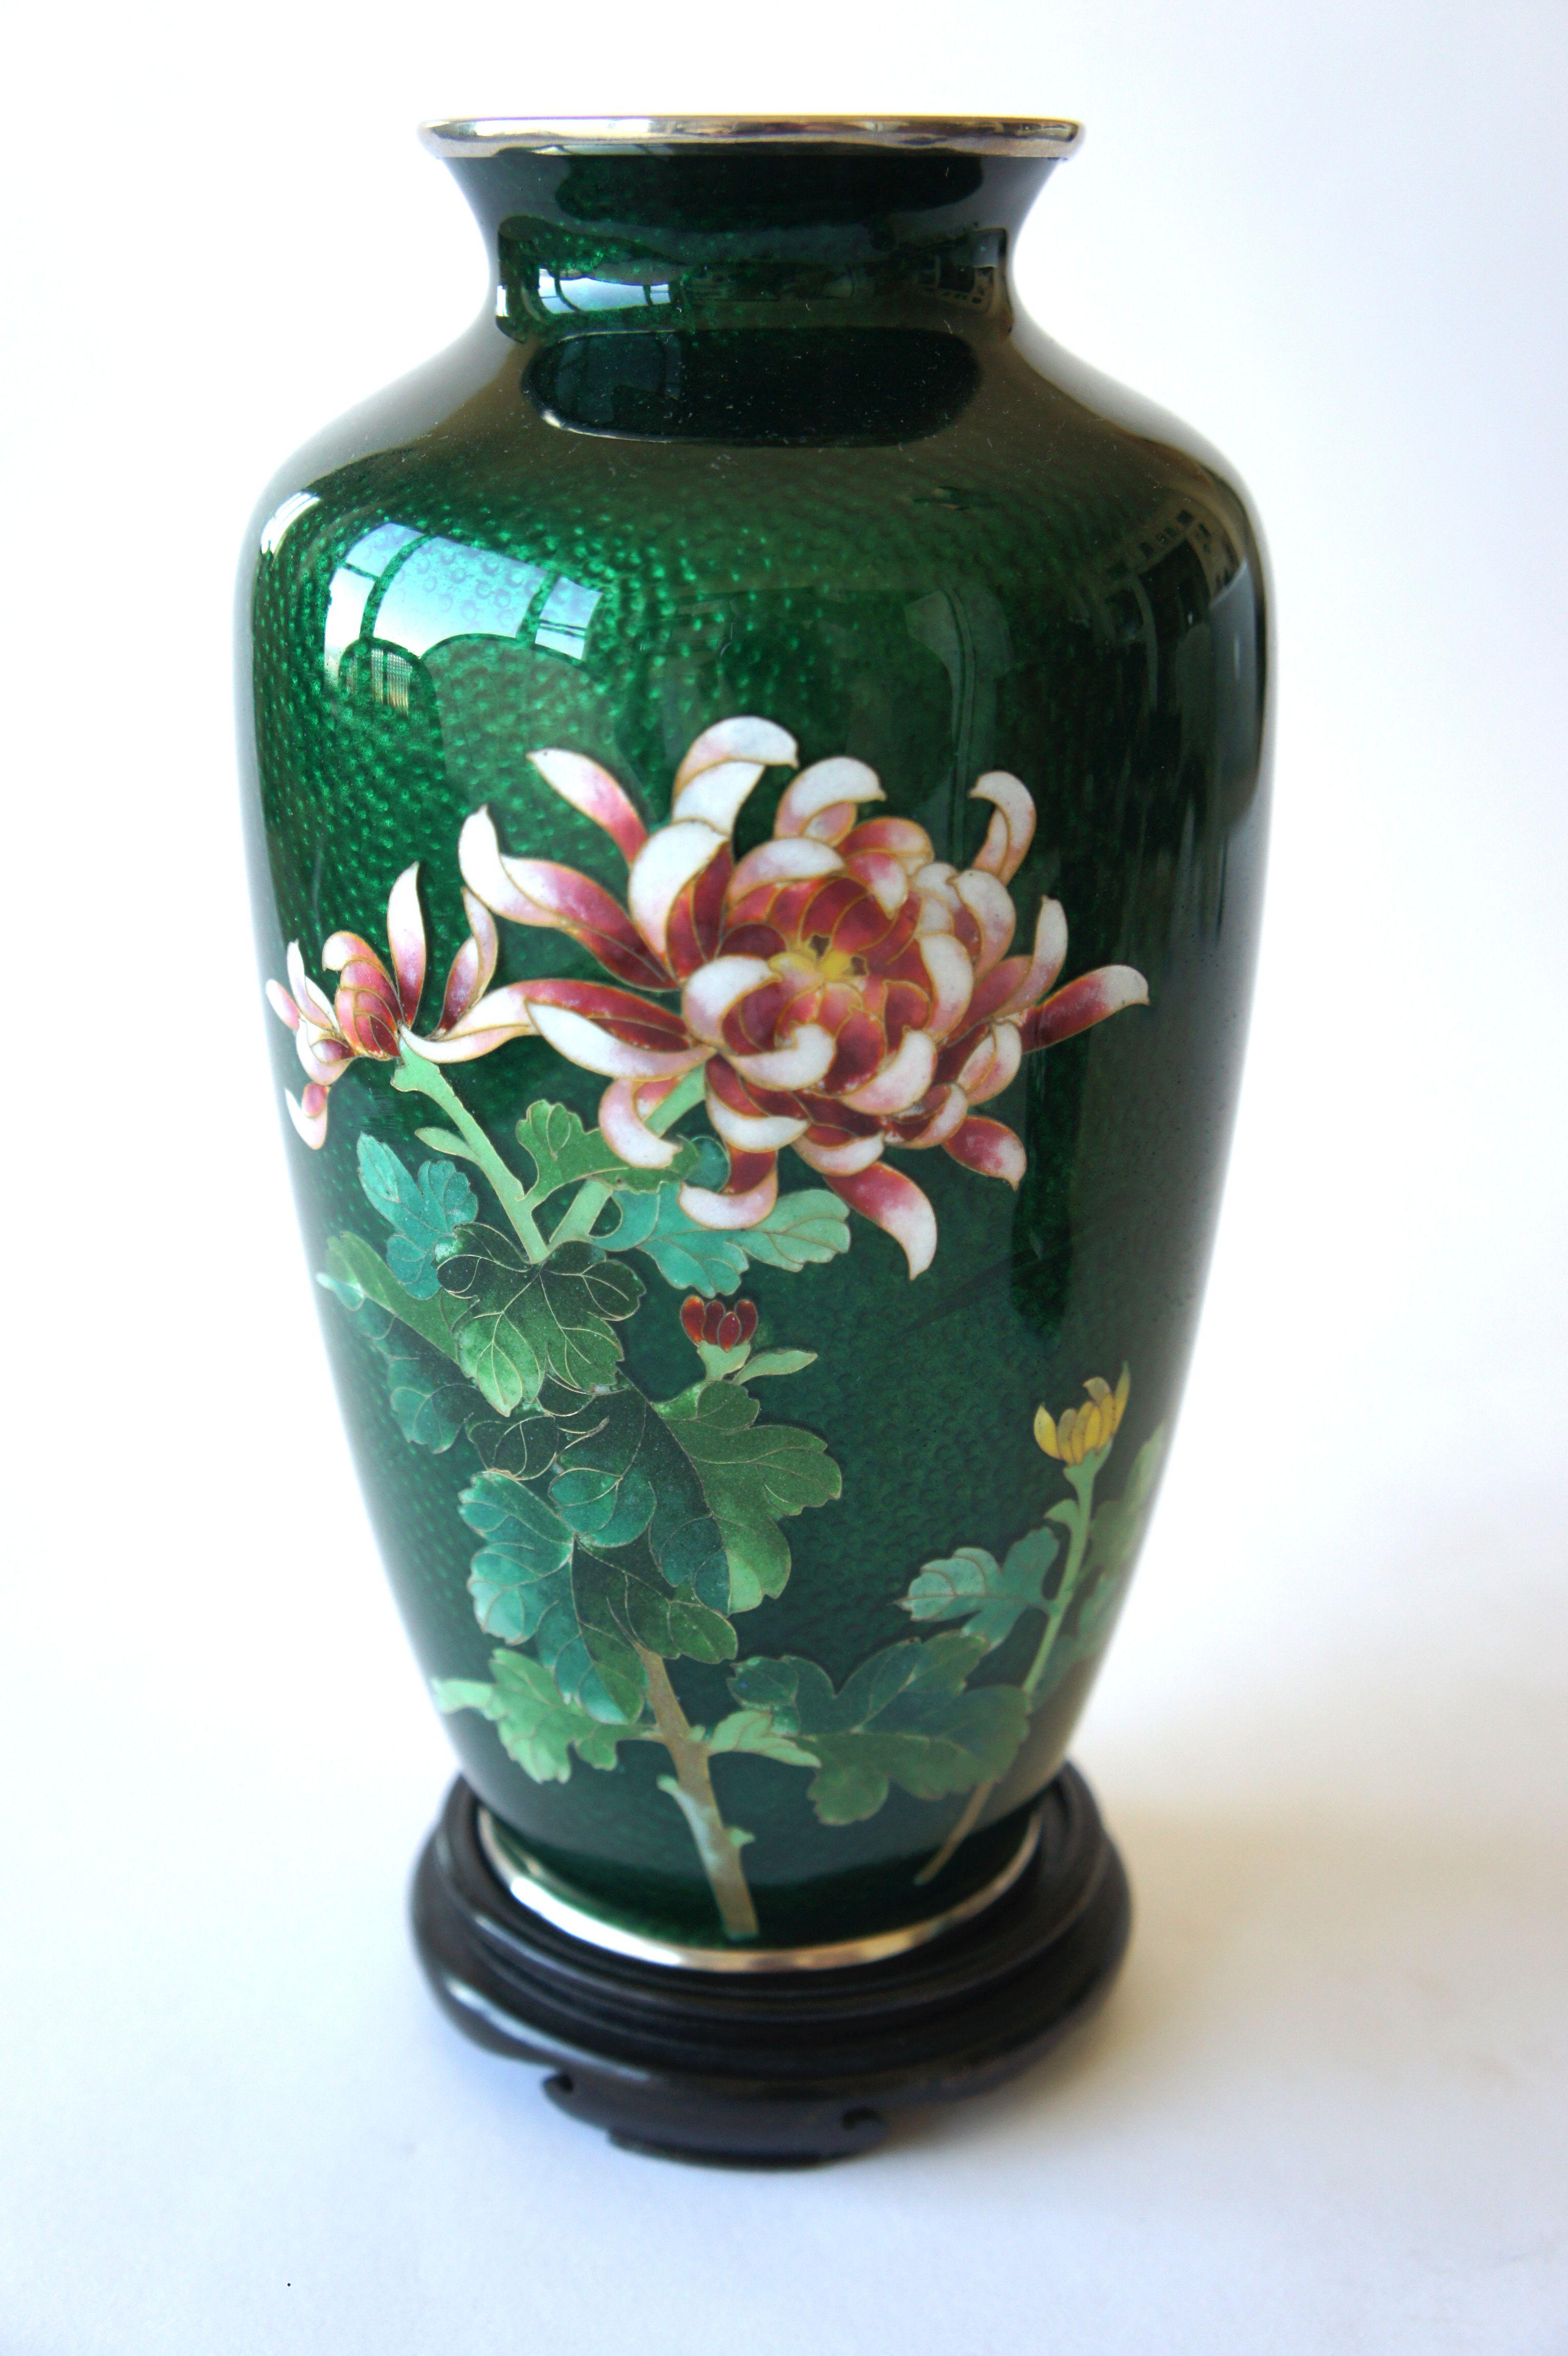 Flowers by post vase - Fine Ando Peony Botan Japanese Ikebana Green Cloisonne Flower Vase Japan Post 1940